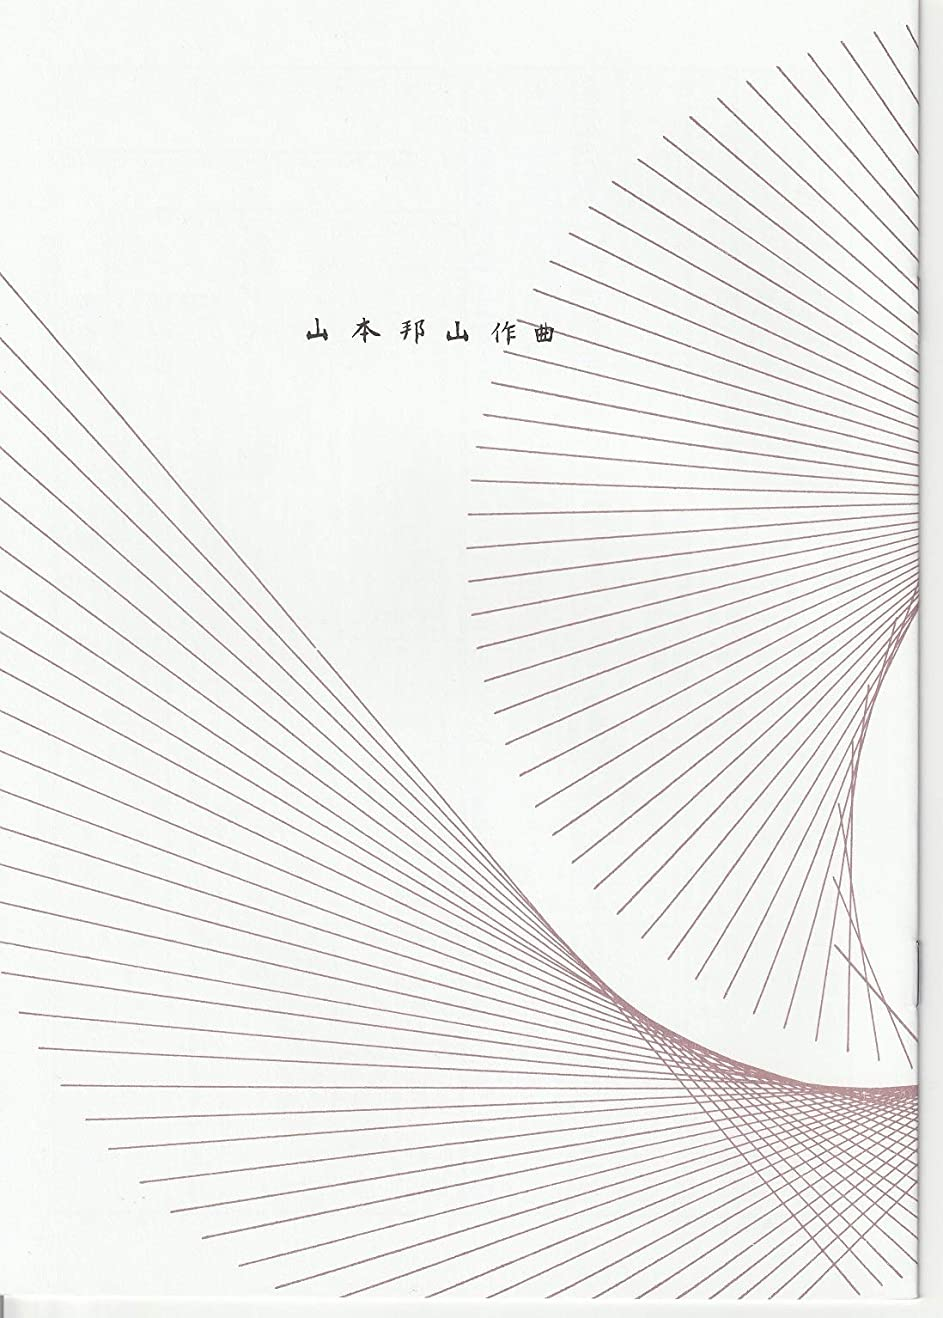 百科事典美しい白内障山本 邦山 作曲 楽譜 都山流 尺八 雨 (送料など込)